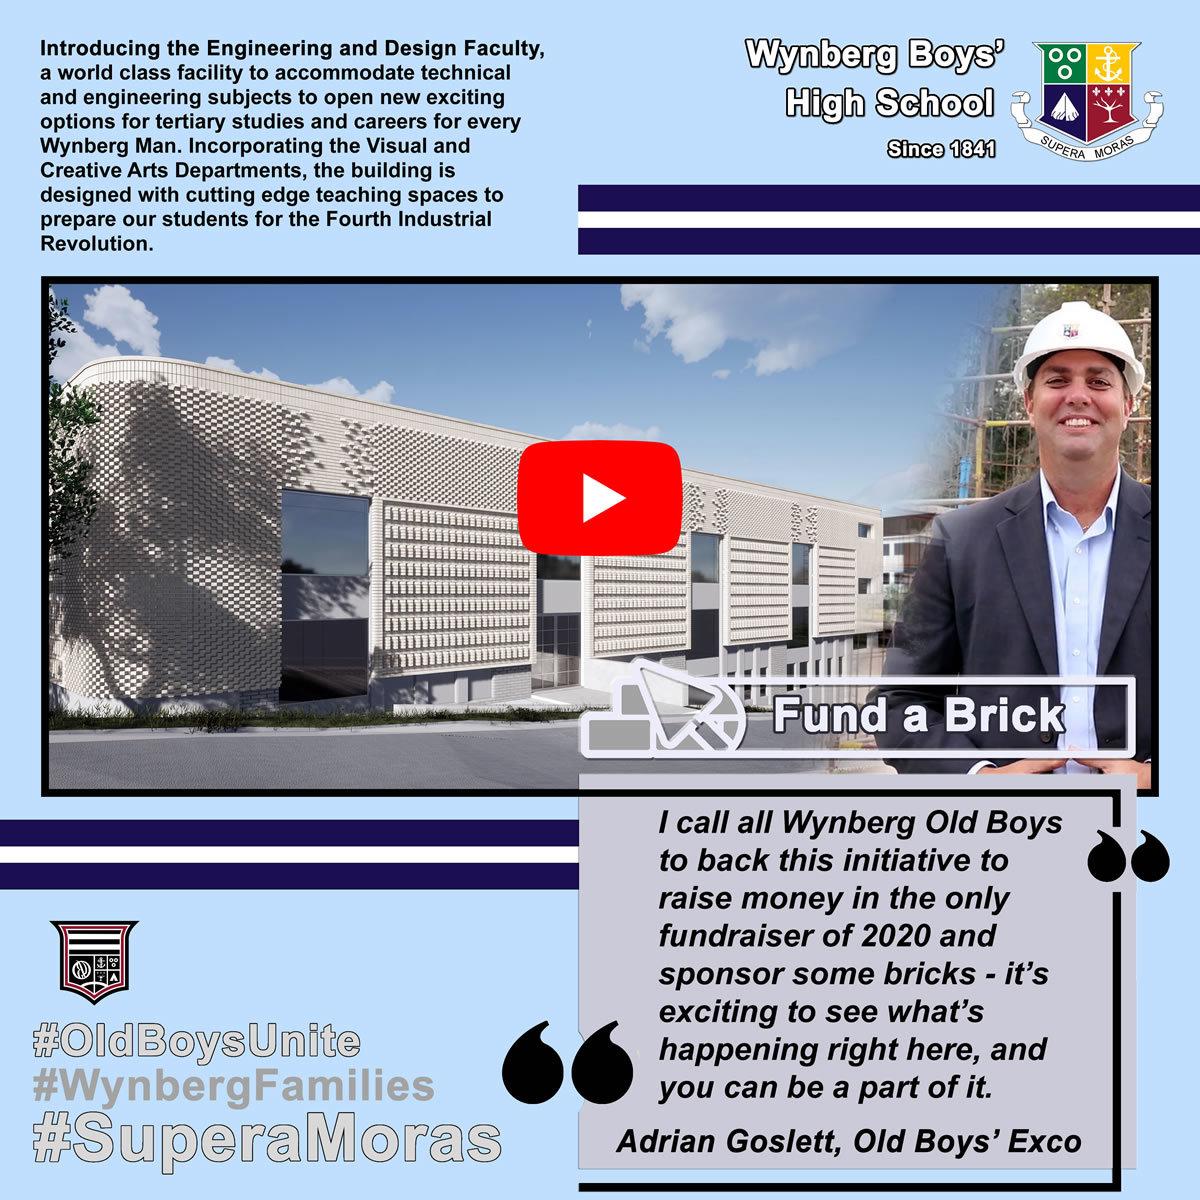 Fund a Brick: Adrian Goslett